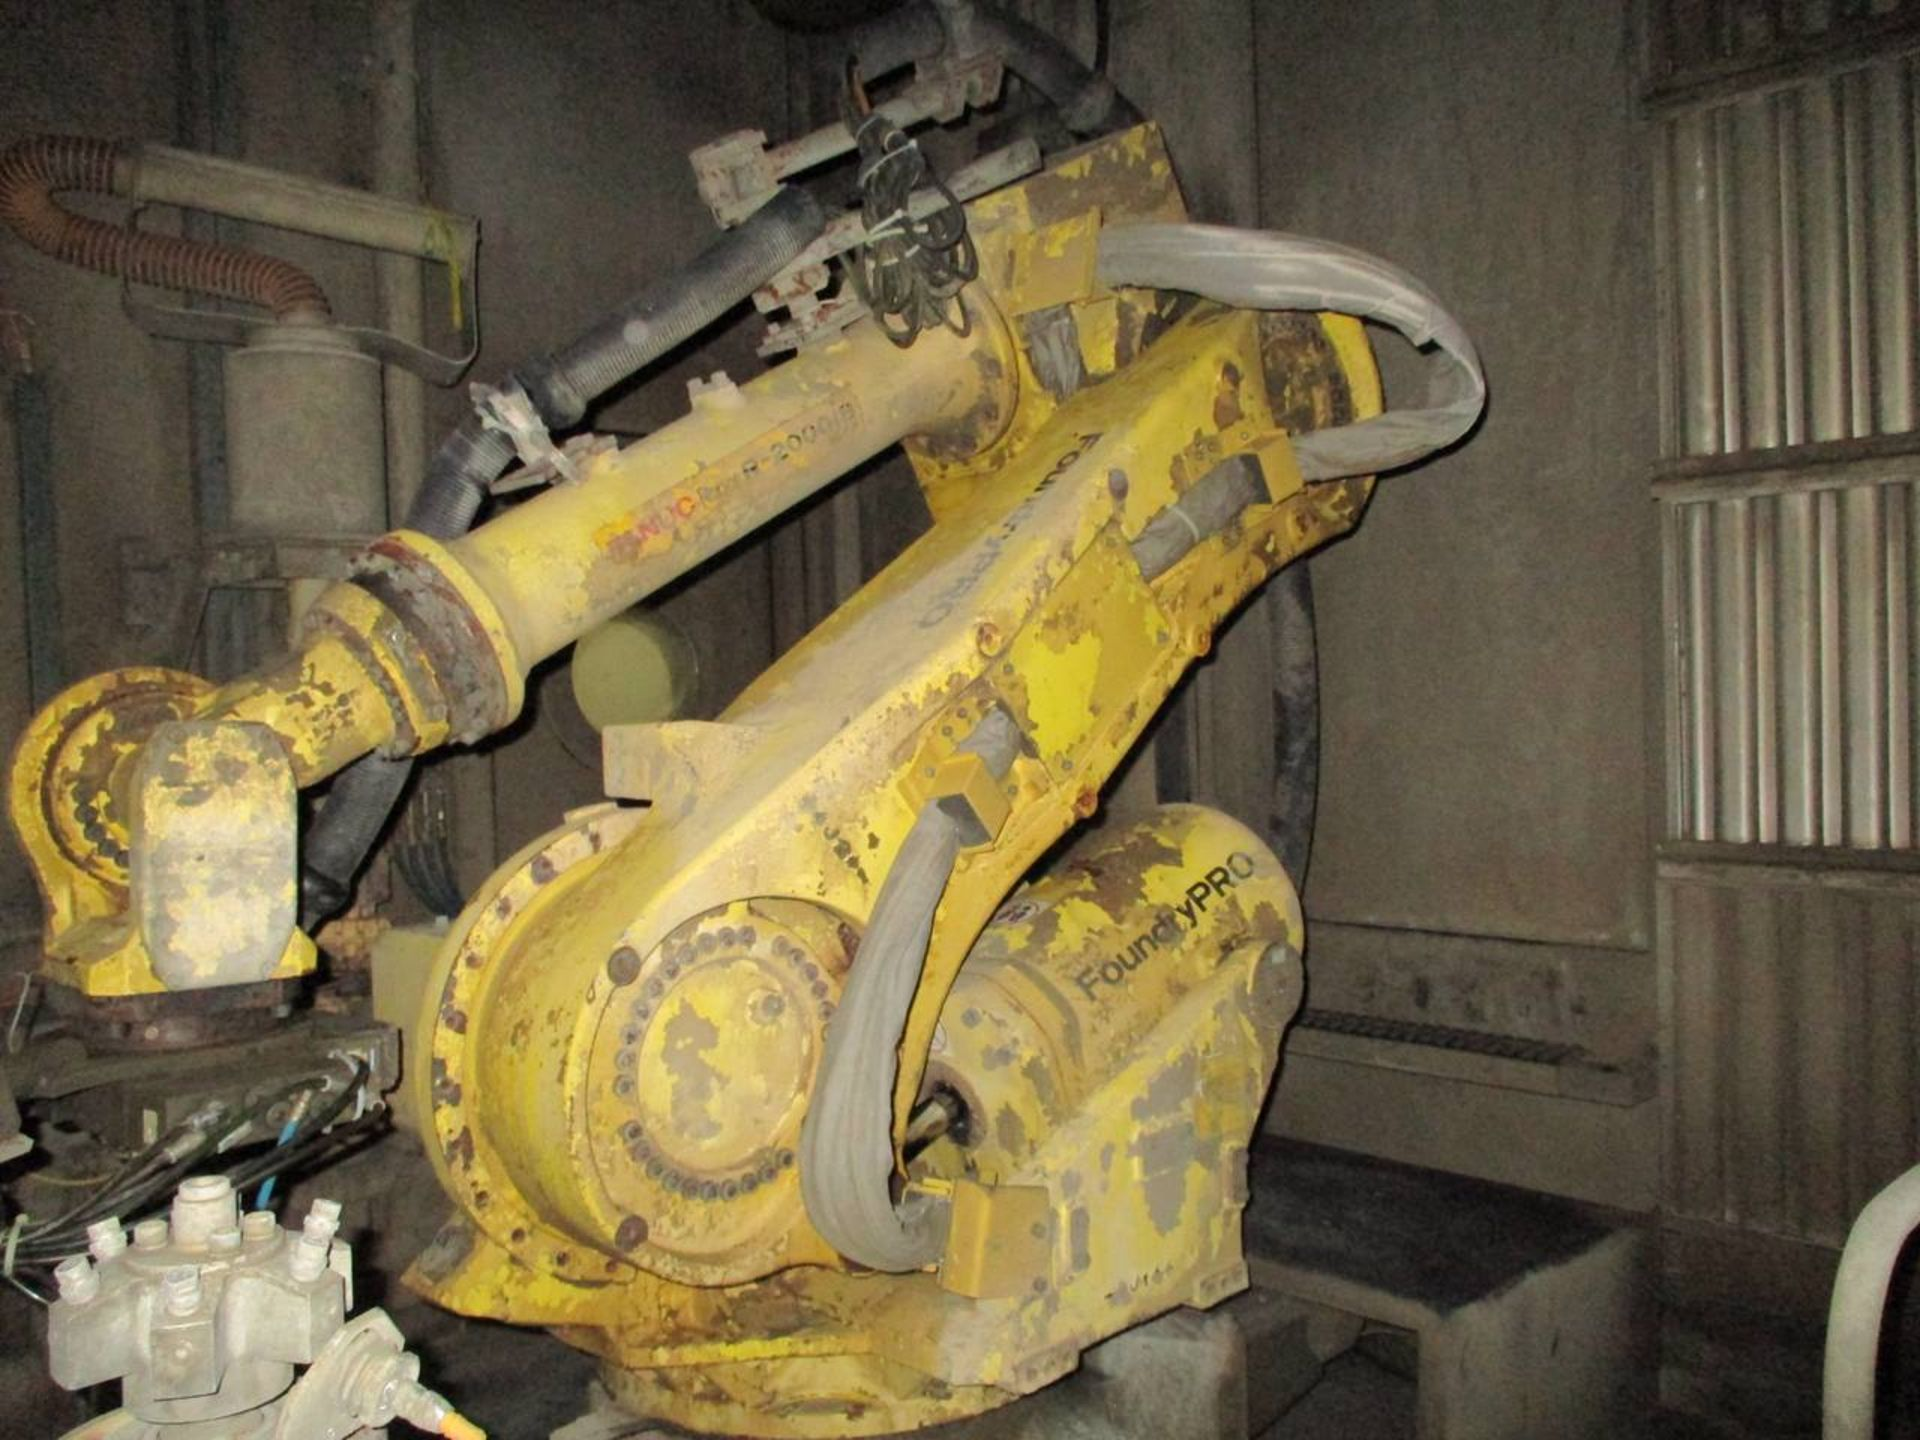 2012 Fanuc R-2000iB 165F Foundry Pro Servo Robot - Image 7 of 7